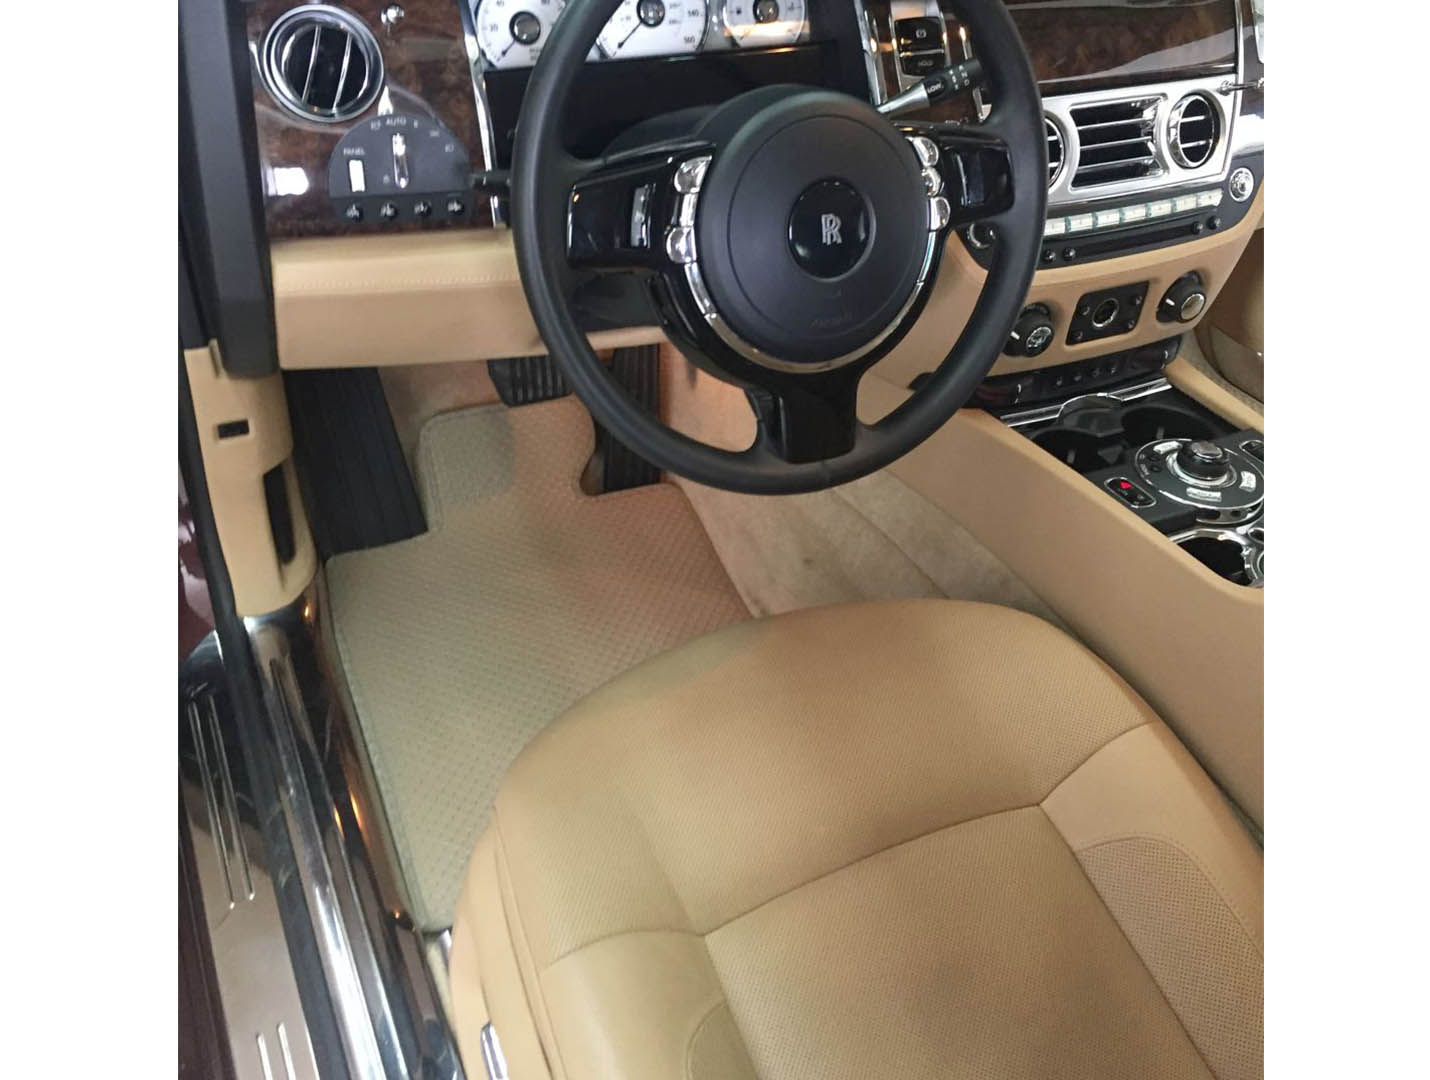 Thảm lót sàn Rolls Royce Ghost 2020